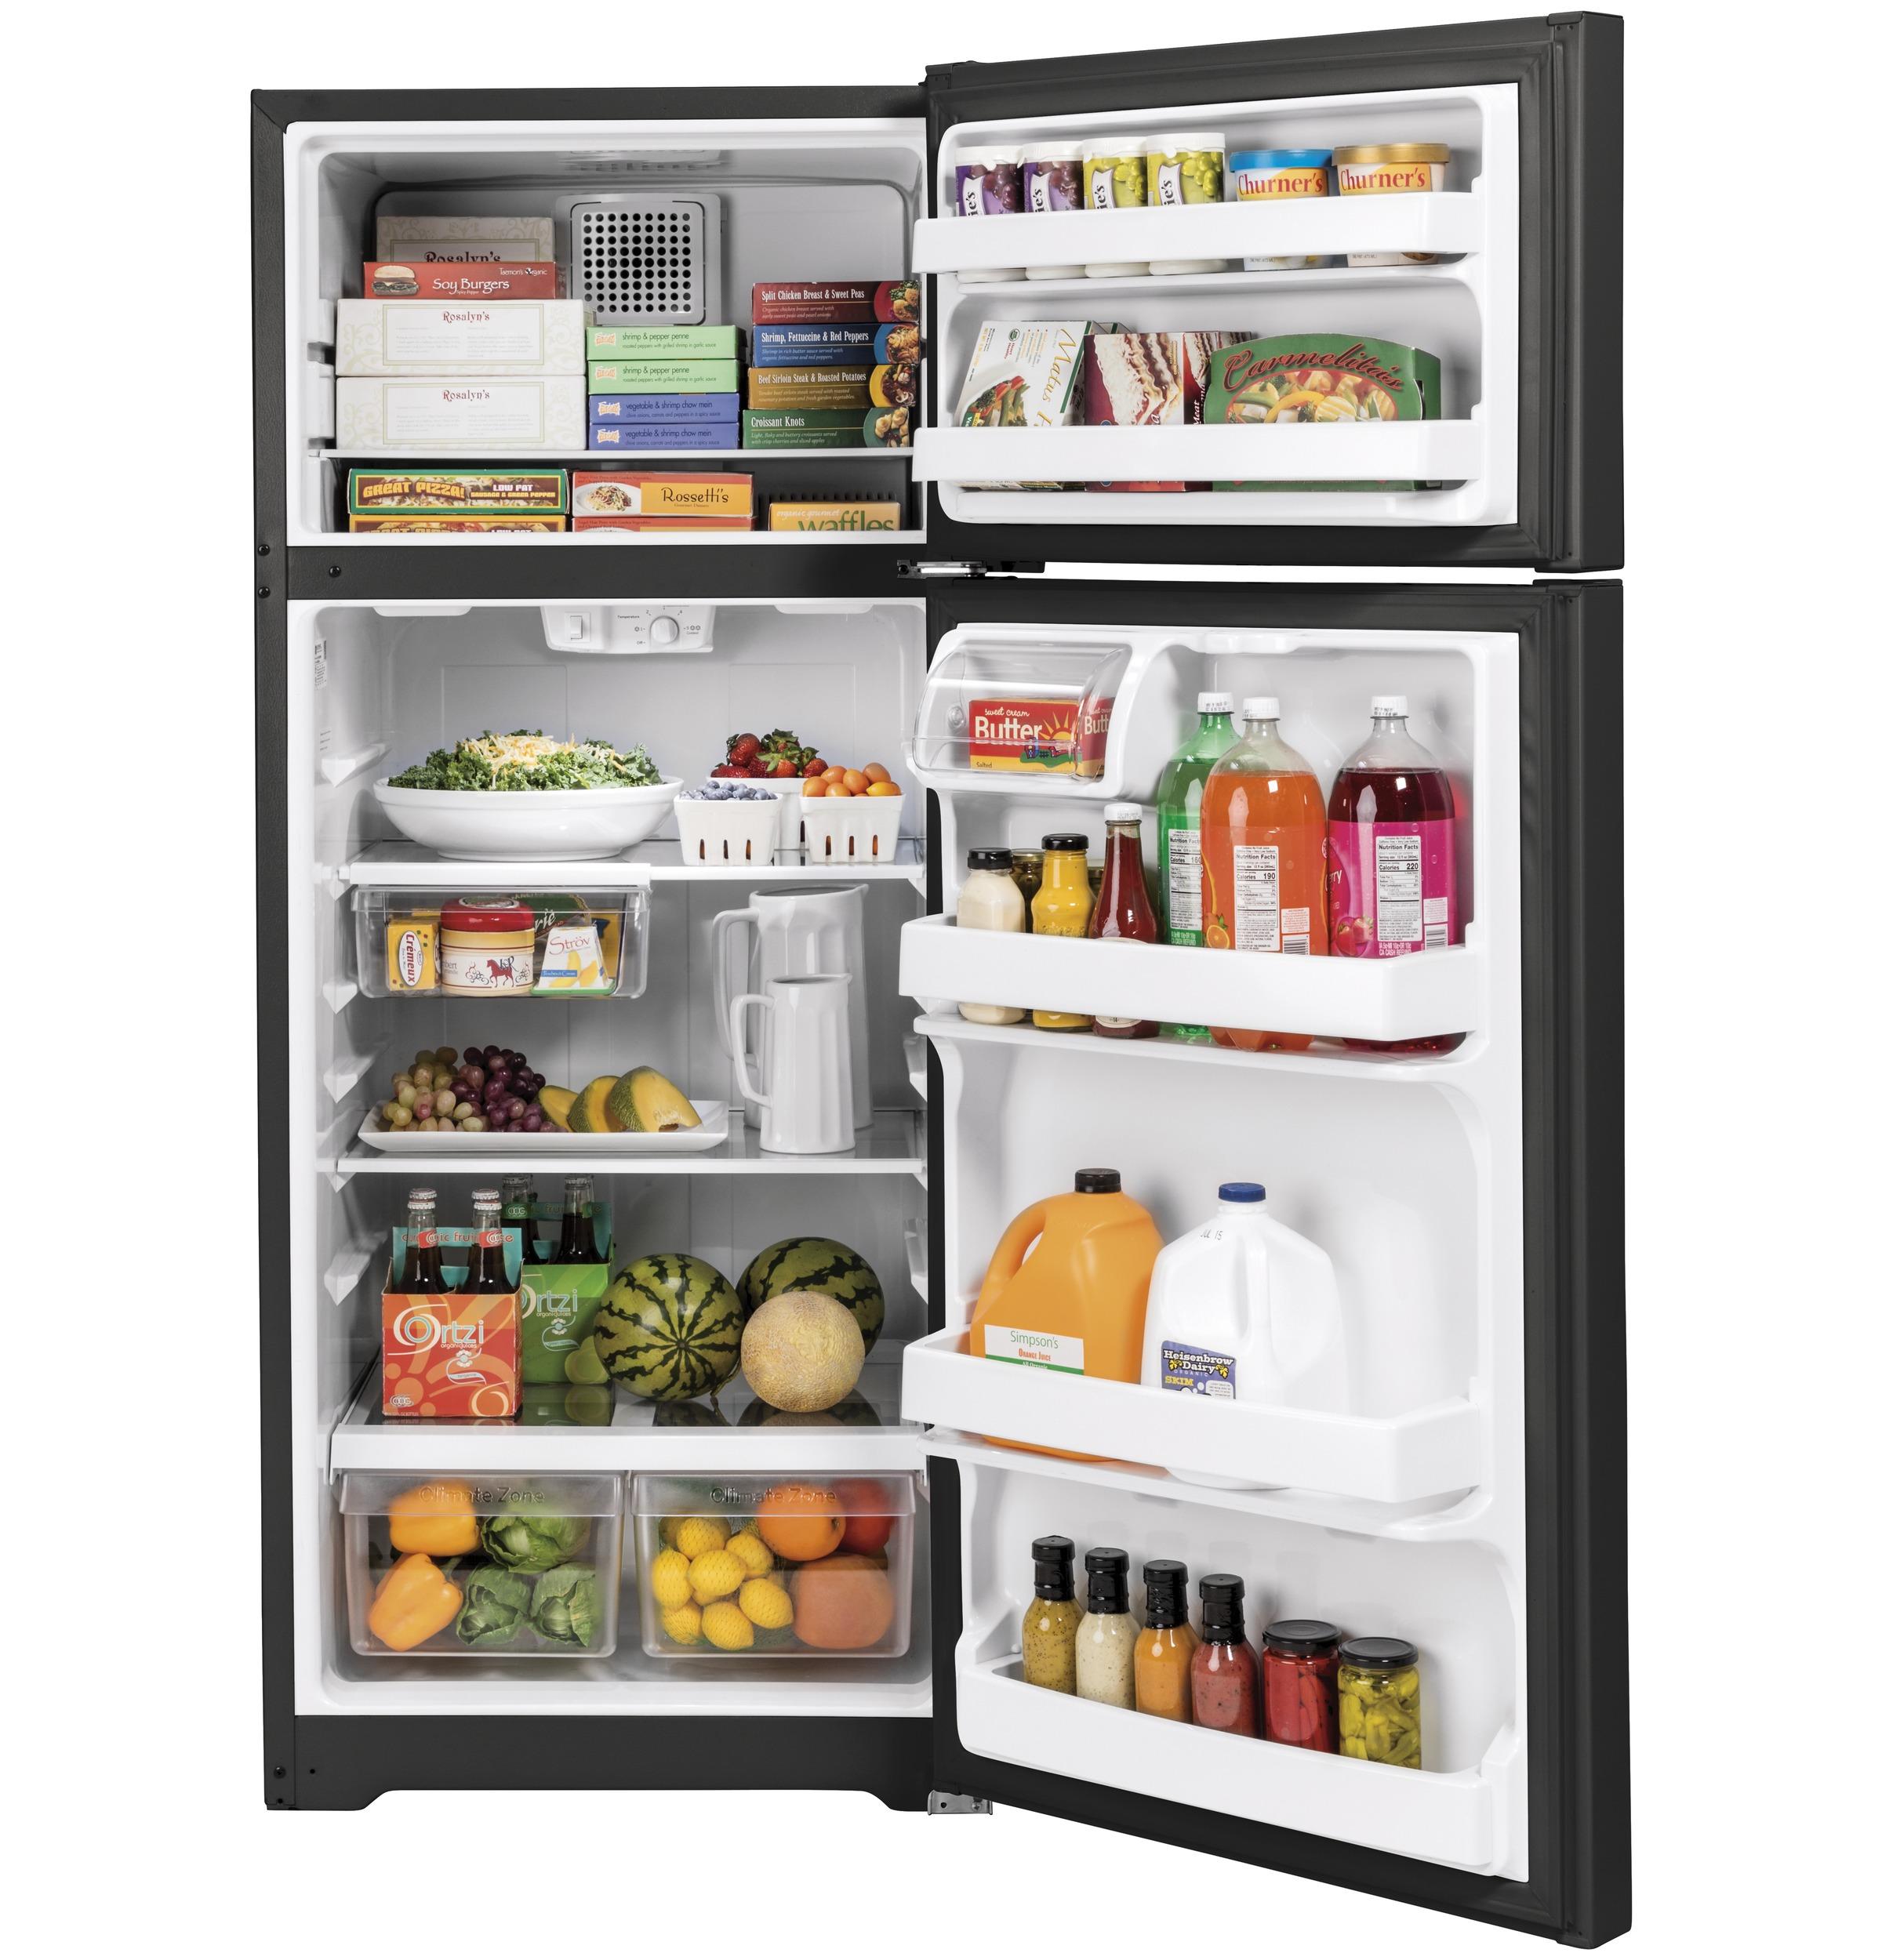 Model: GTS18HGNRBB | GE GE® 17.5 Cu. Ft. Top-Freezer Refrigerator